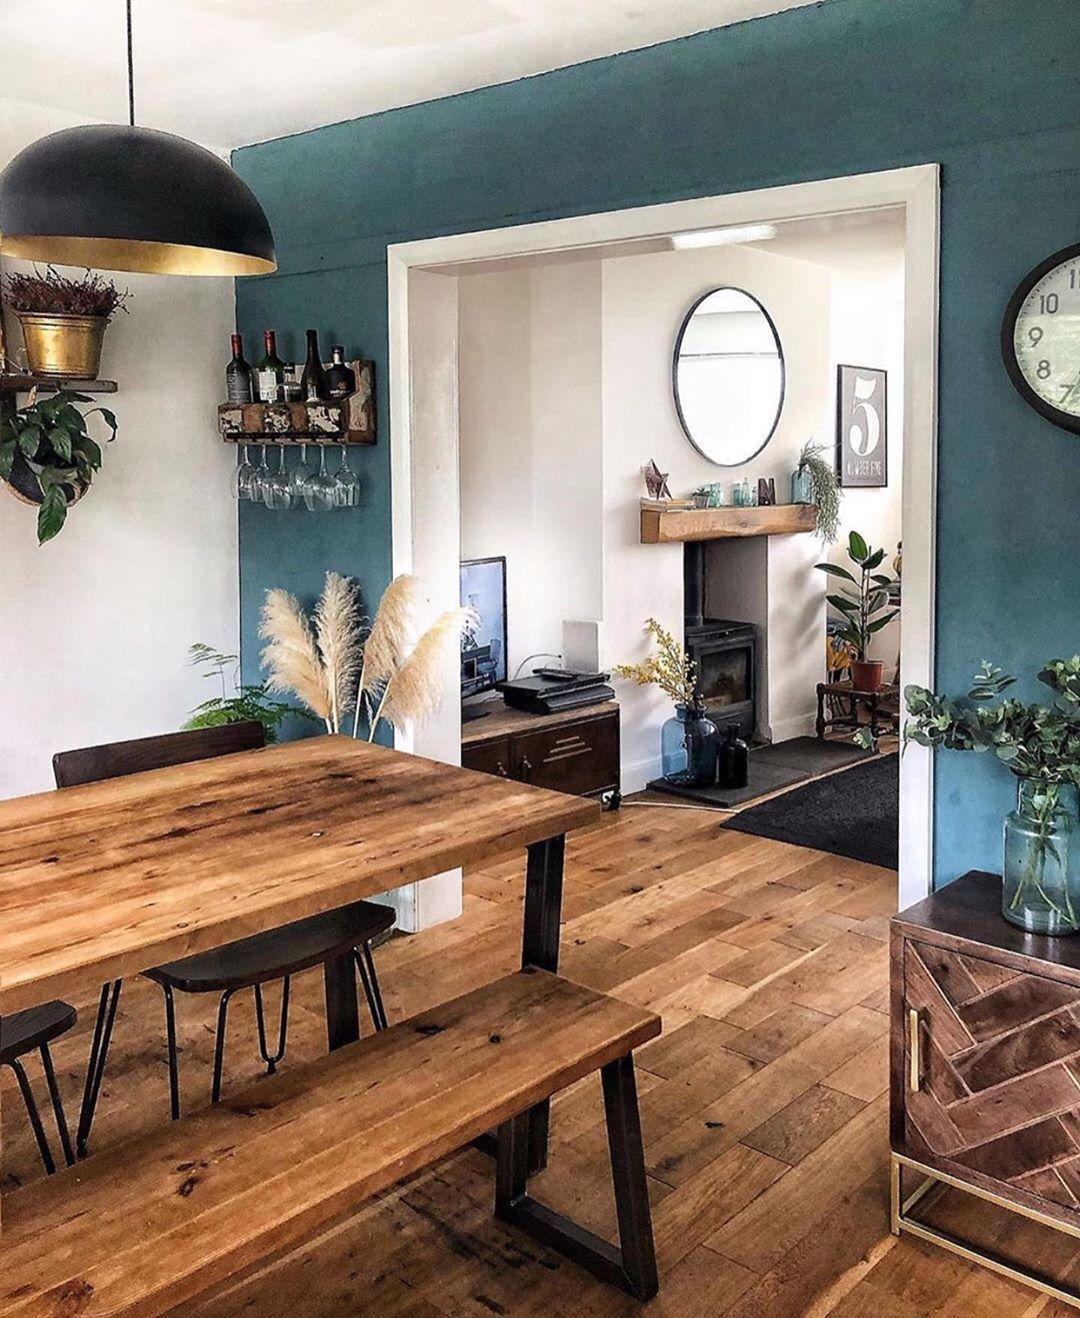 "Inspi_Deco on Instagram: ""️ Kitchen decor � � Inspi @theonlygirlinthegaff #picoftheday #instalike #kitchen #kitchendesign #kitchendecor #kitchenview #homedecor…"""